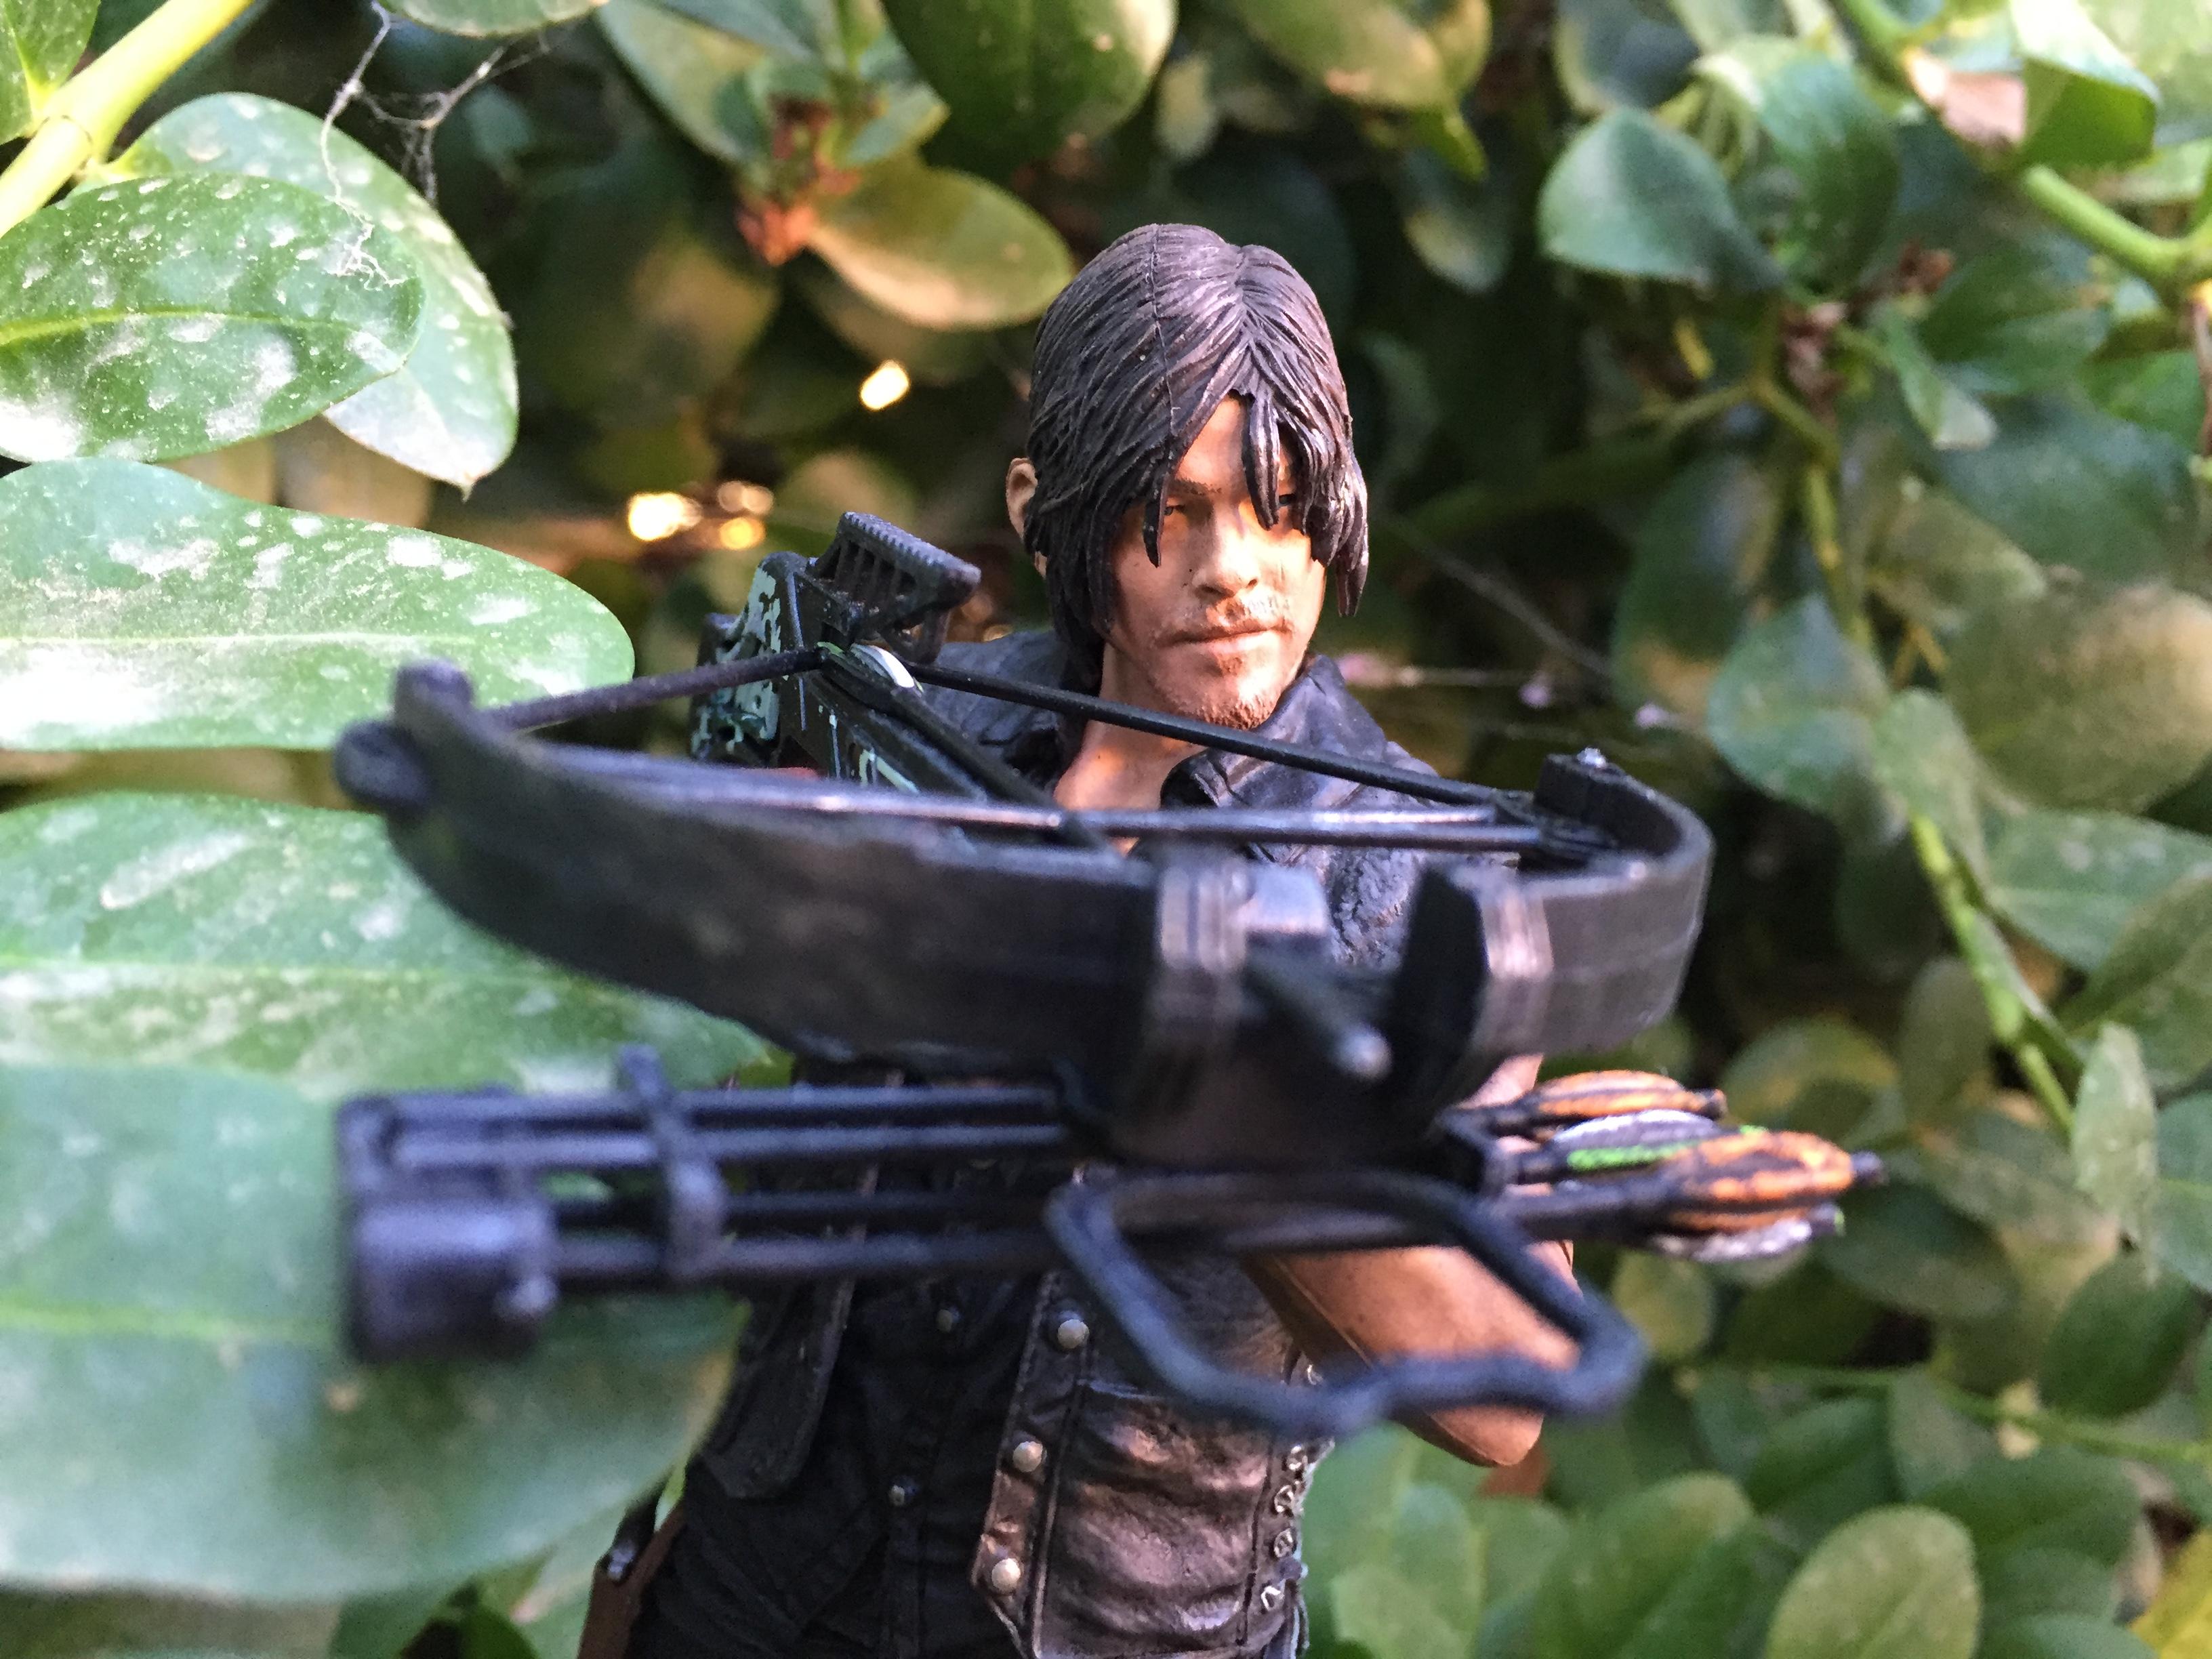 Mcfarlane walking dead series 6 daryl dixon action figure - 7 Inch Daryl 5